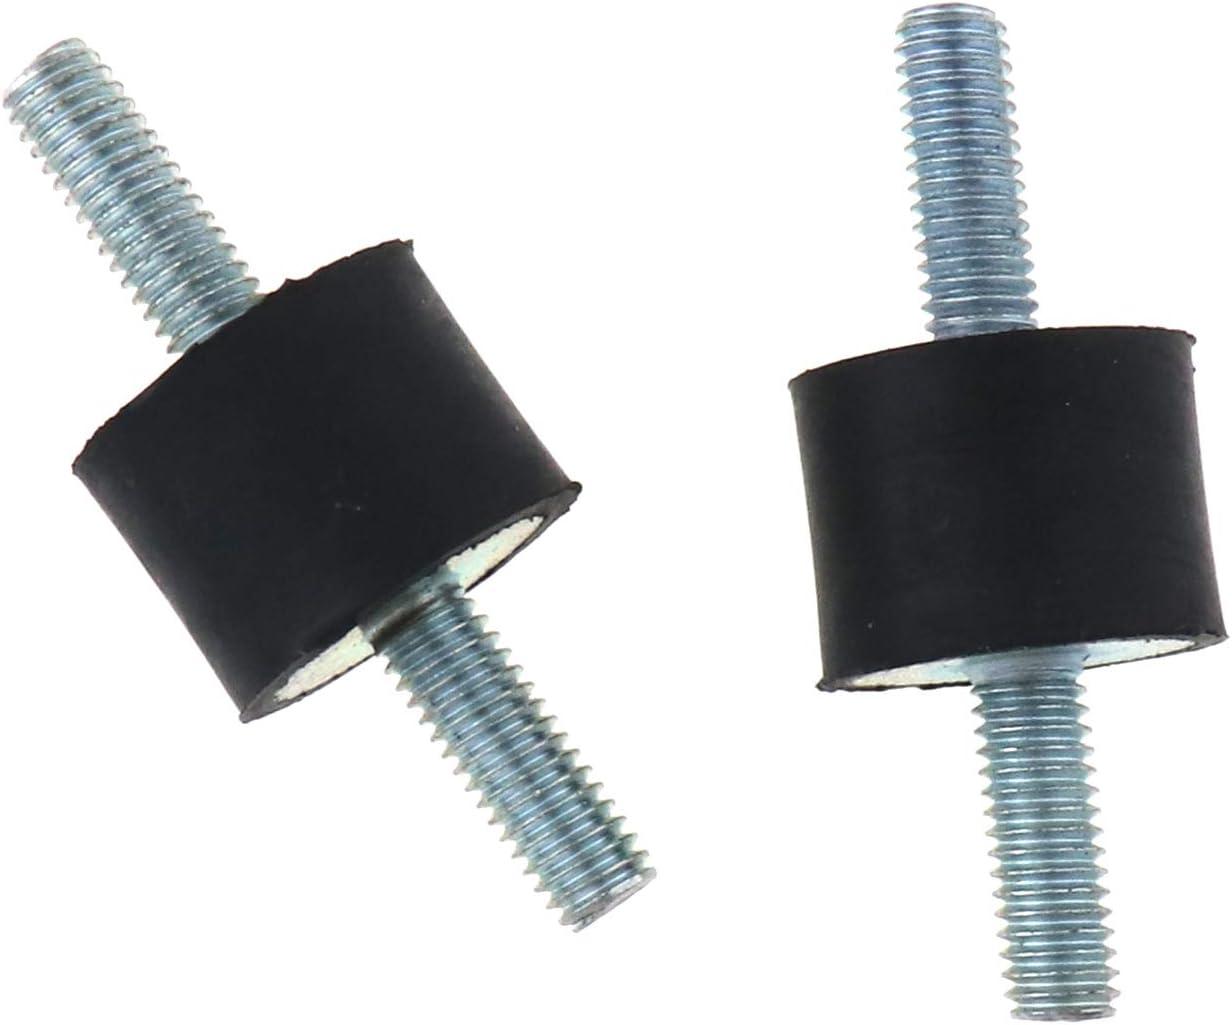 ENET 4 St/ück Gummi-Halterungen M6 M8 Anti-Vibration Gummi Halterungen Isolator Spule Auto Sto/ßd/ämpfer MF M8 20x30mm